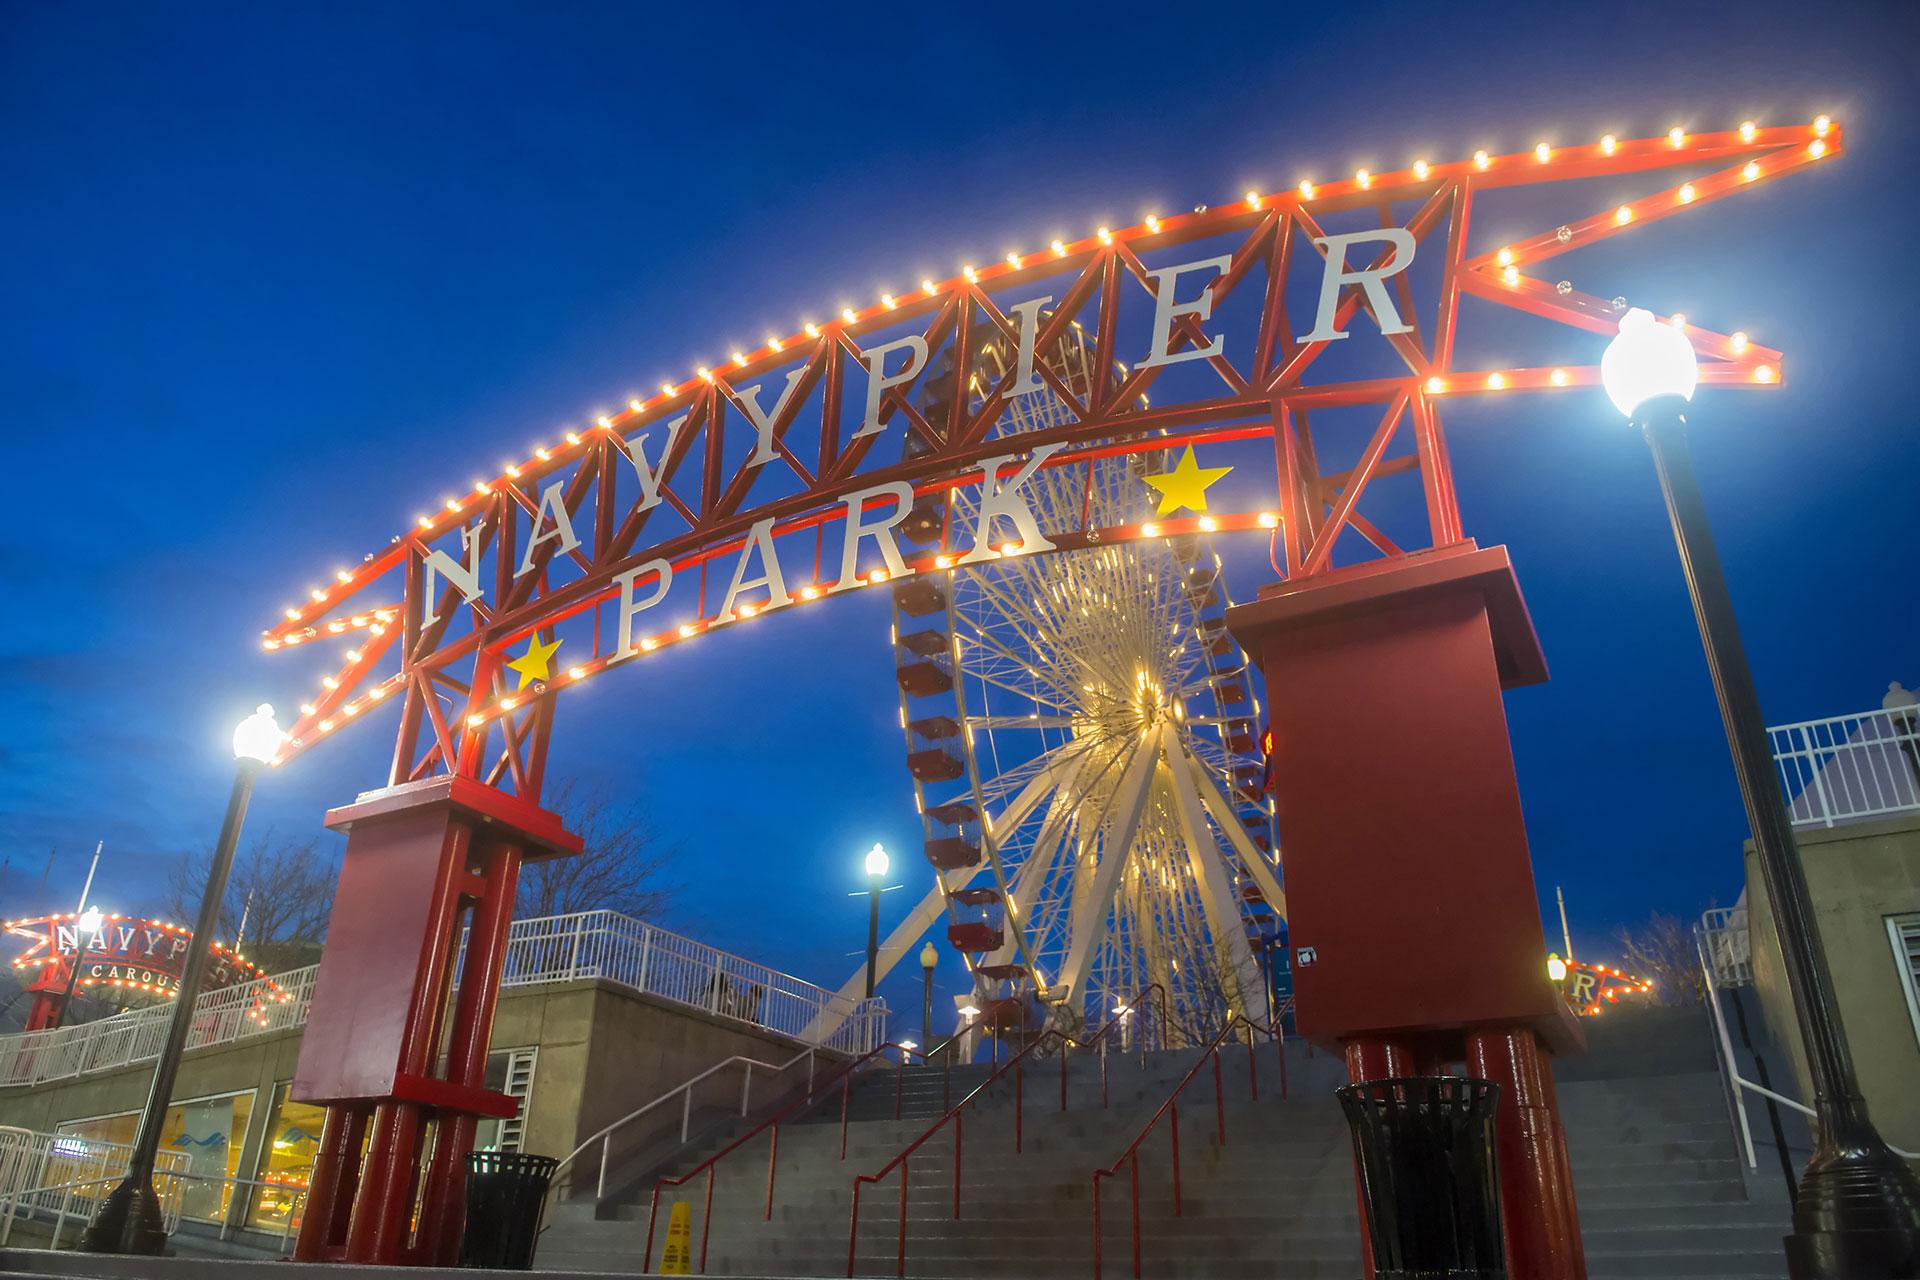 Chicago's Navy Pier; Courtesy of Kobby Dagan/Shutterstock.com